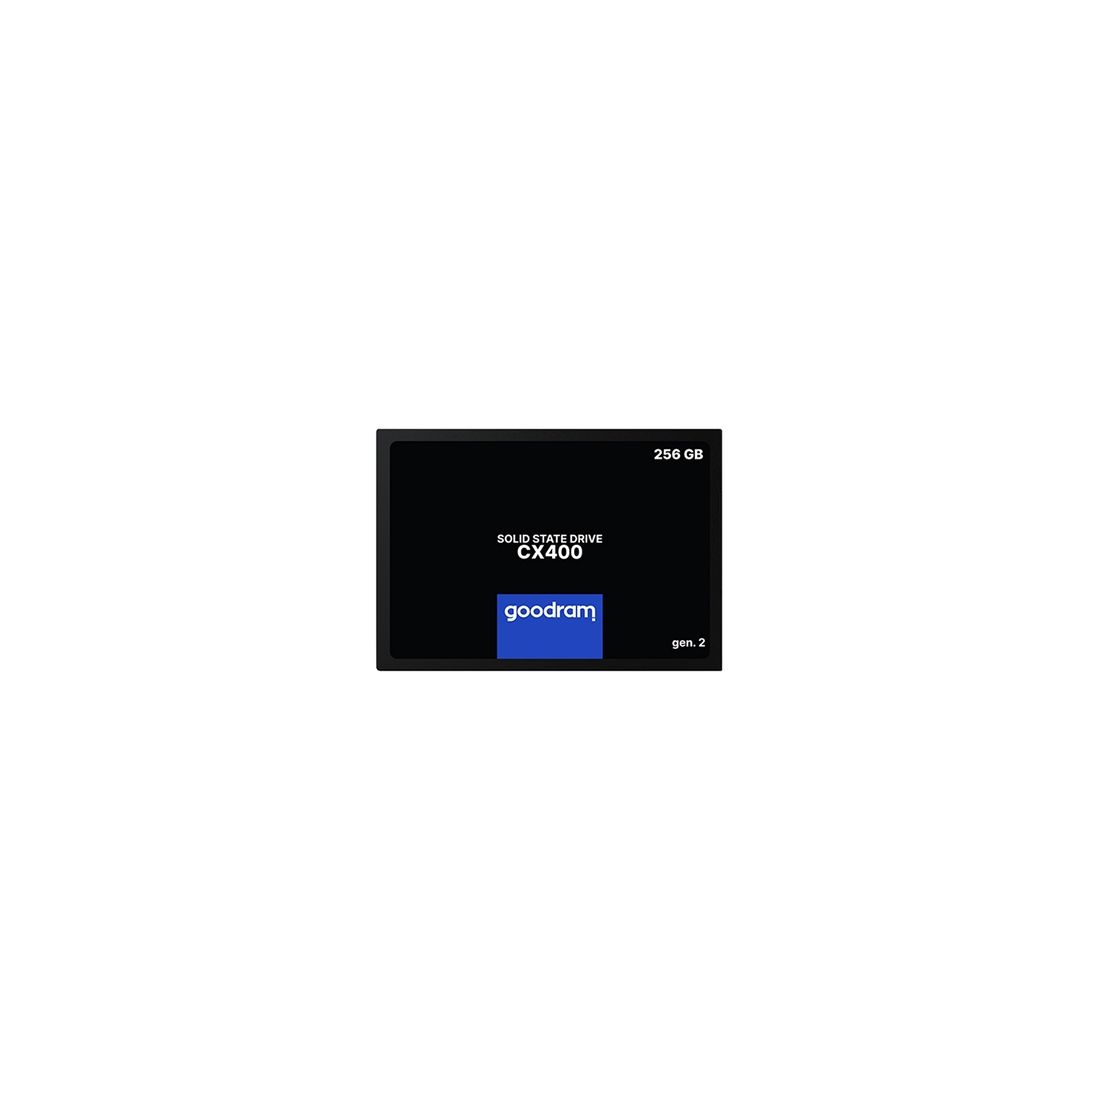 Goodram SSD 256GB 25 SATA3 CX400 GEN2